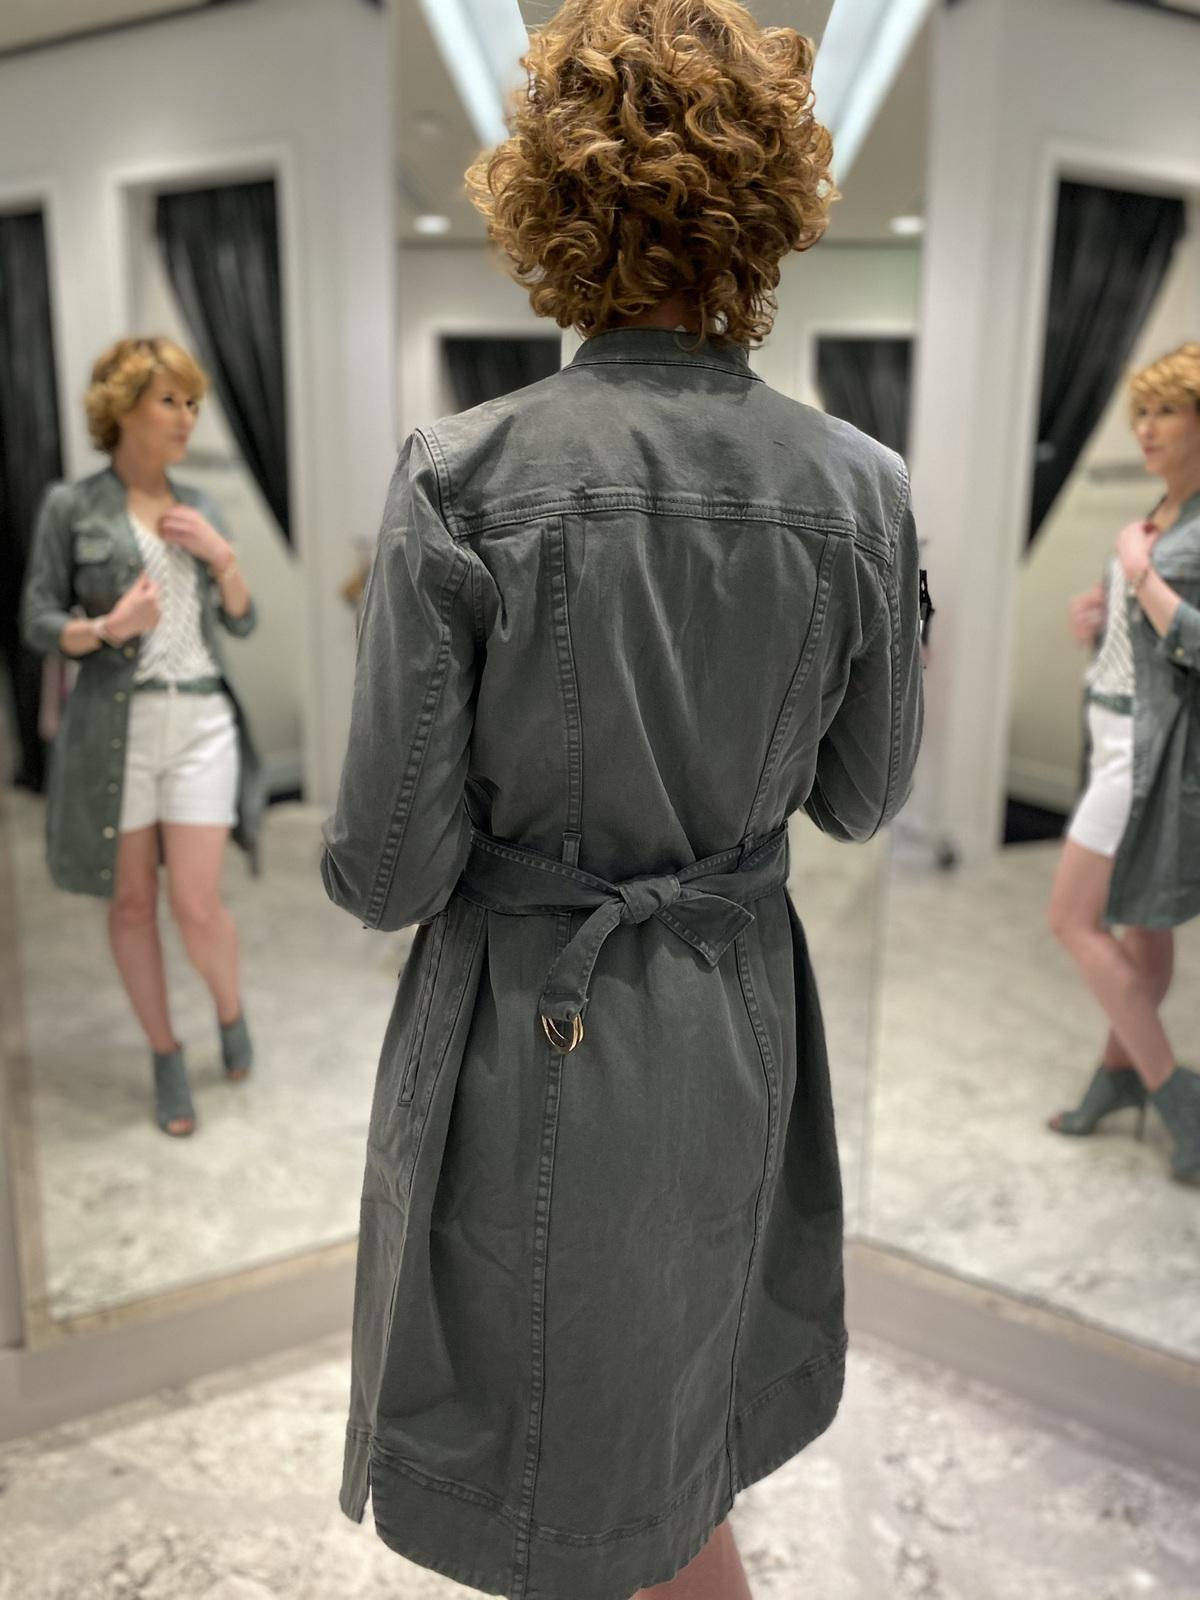 Mirror selfie of back of woman over 50 wearing green shirtdress as a jacket green laser cut booties